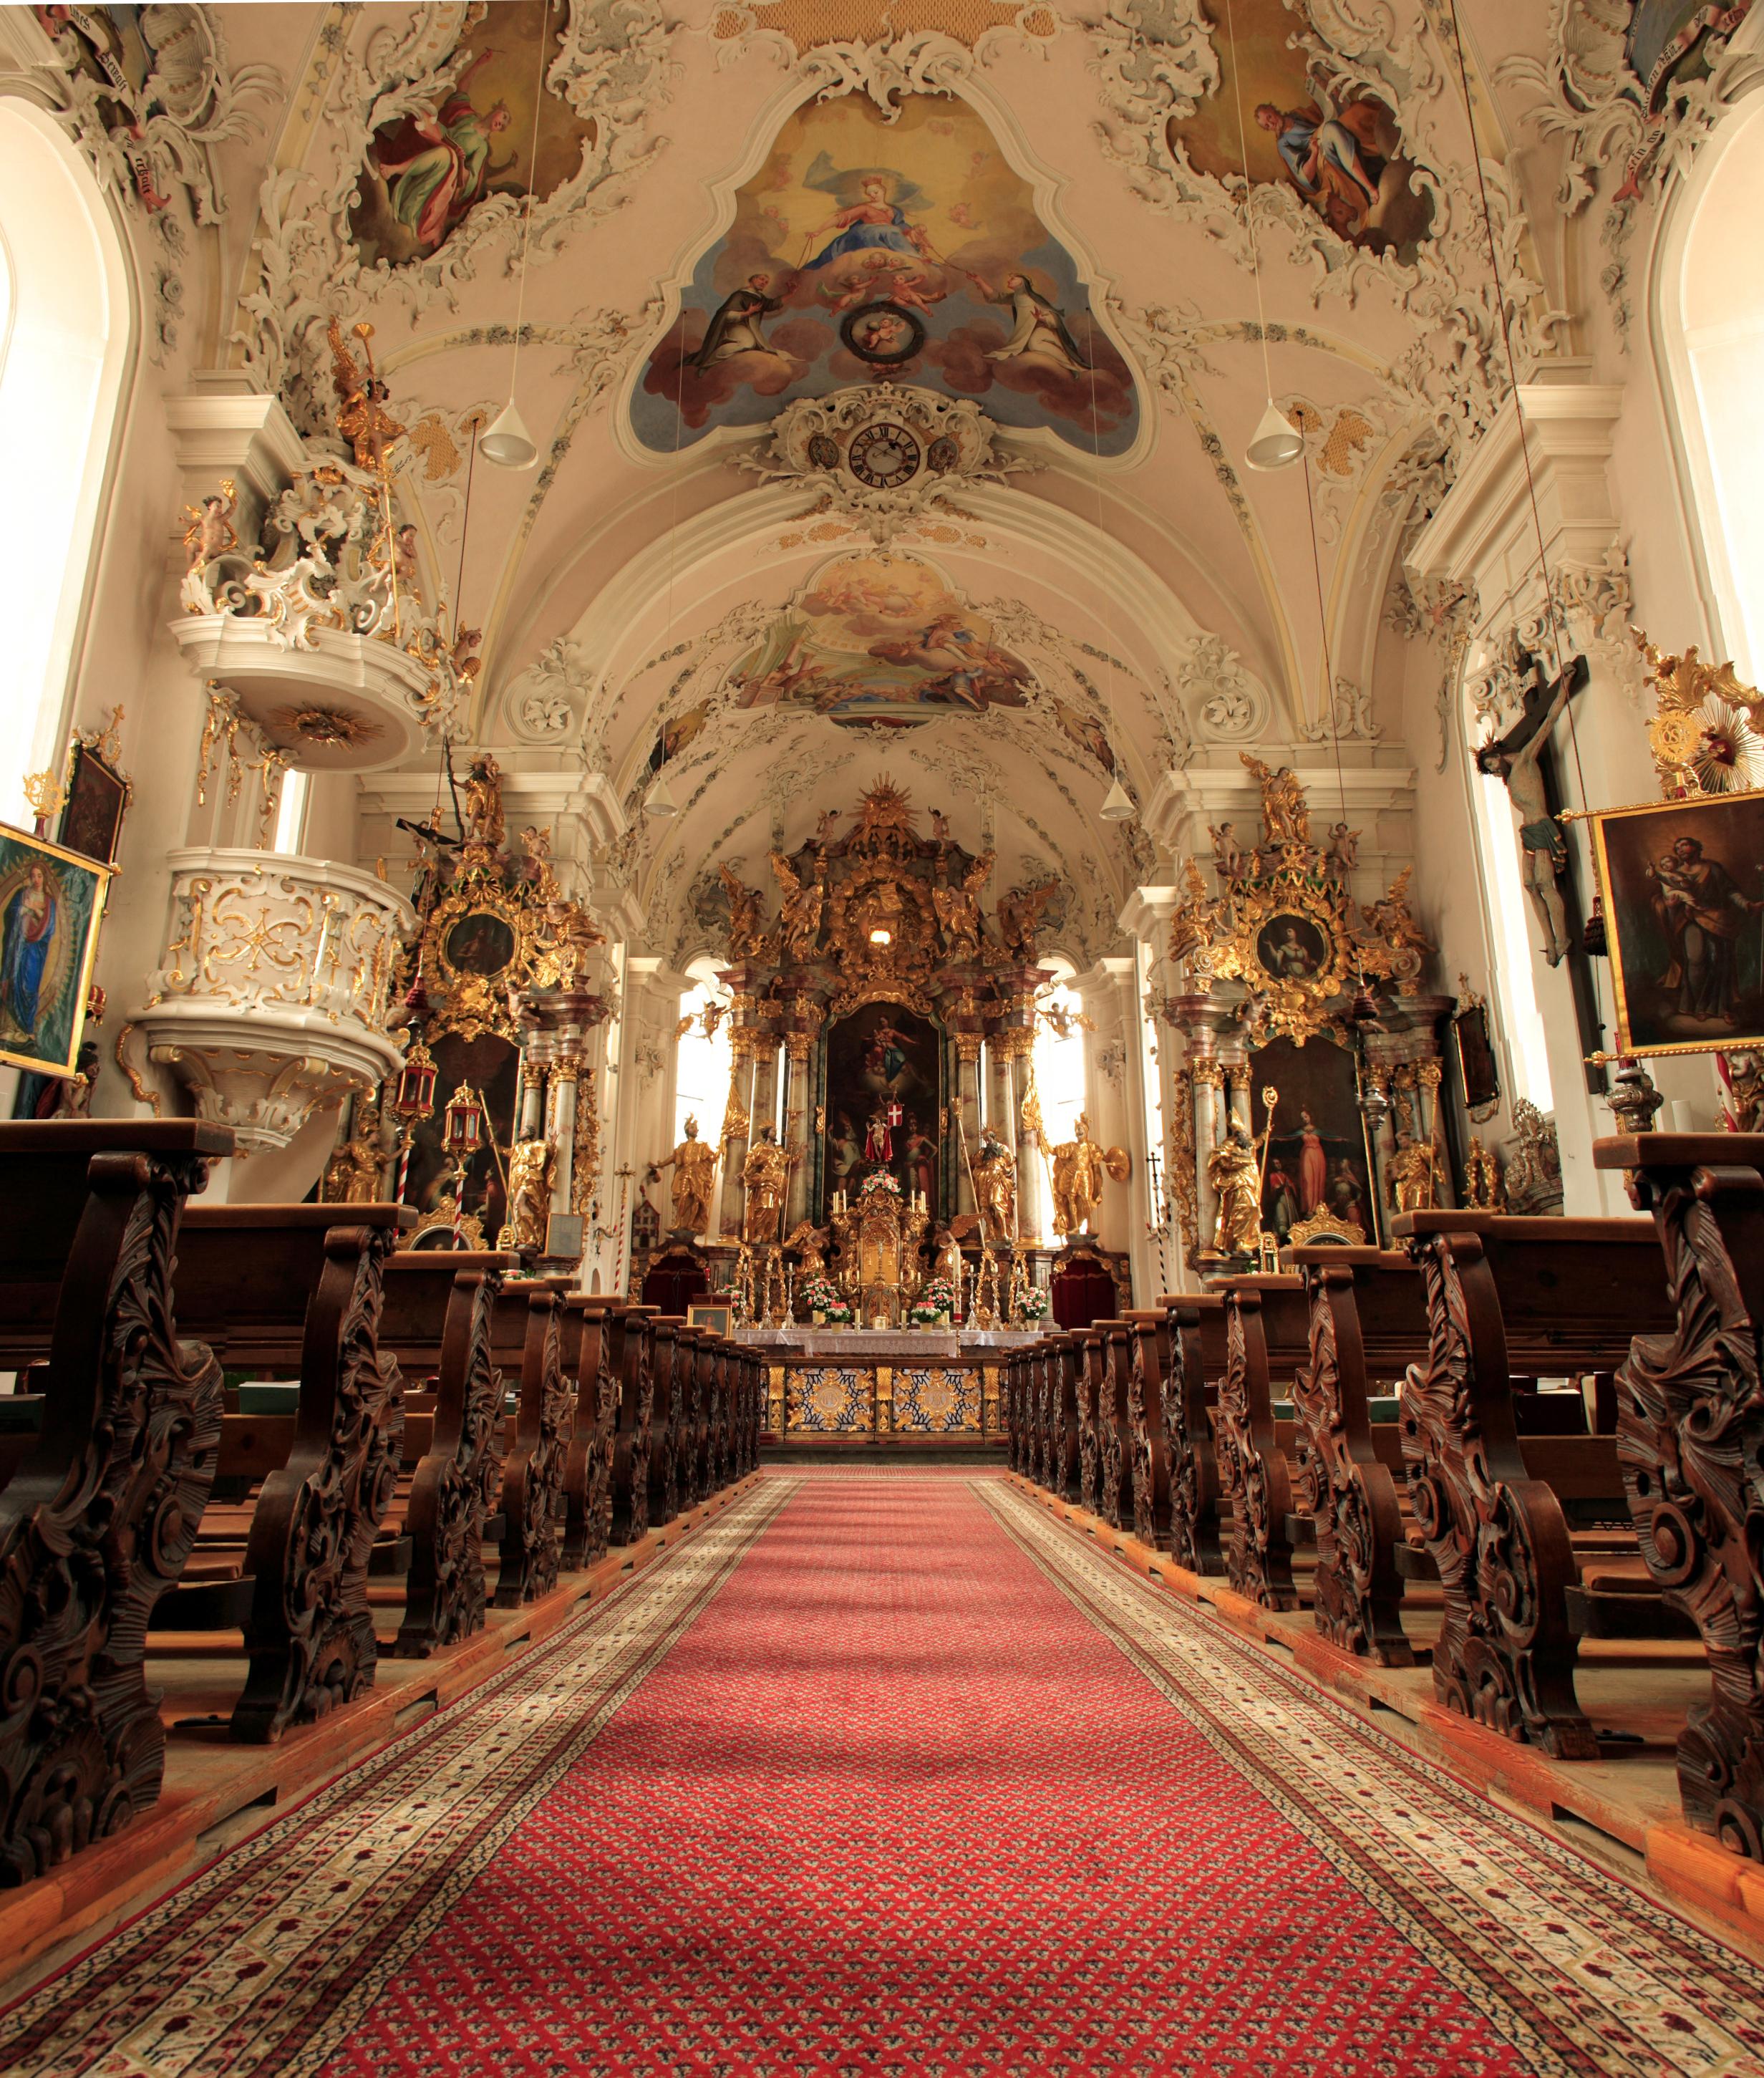 Marvelous File:Ischgl Church Interior From Below.jpeg